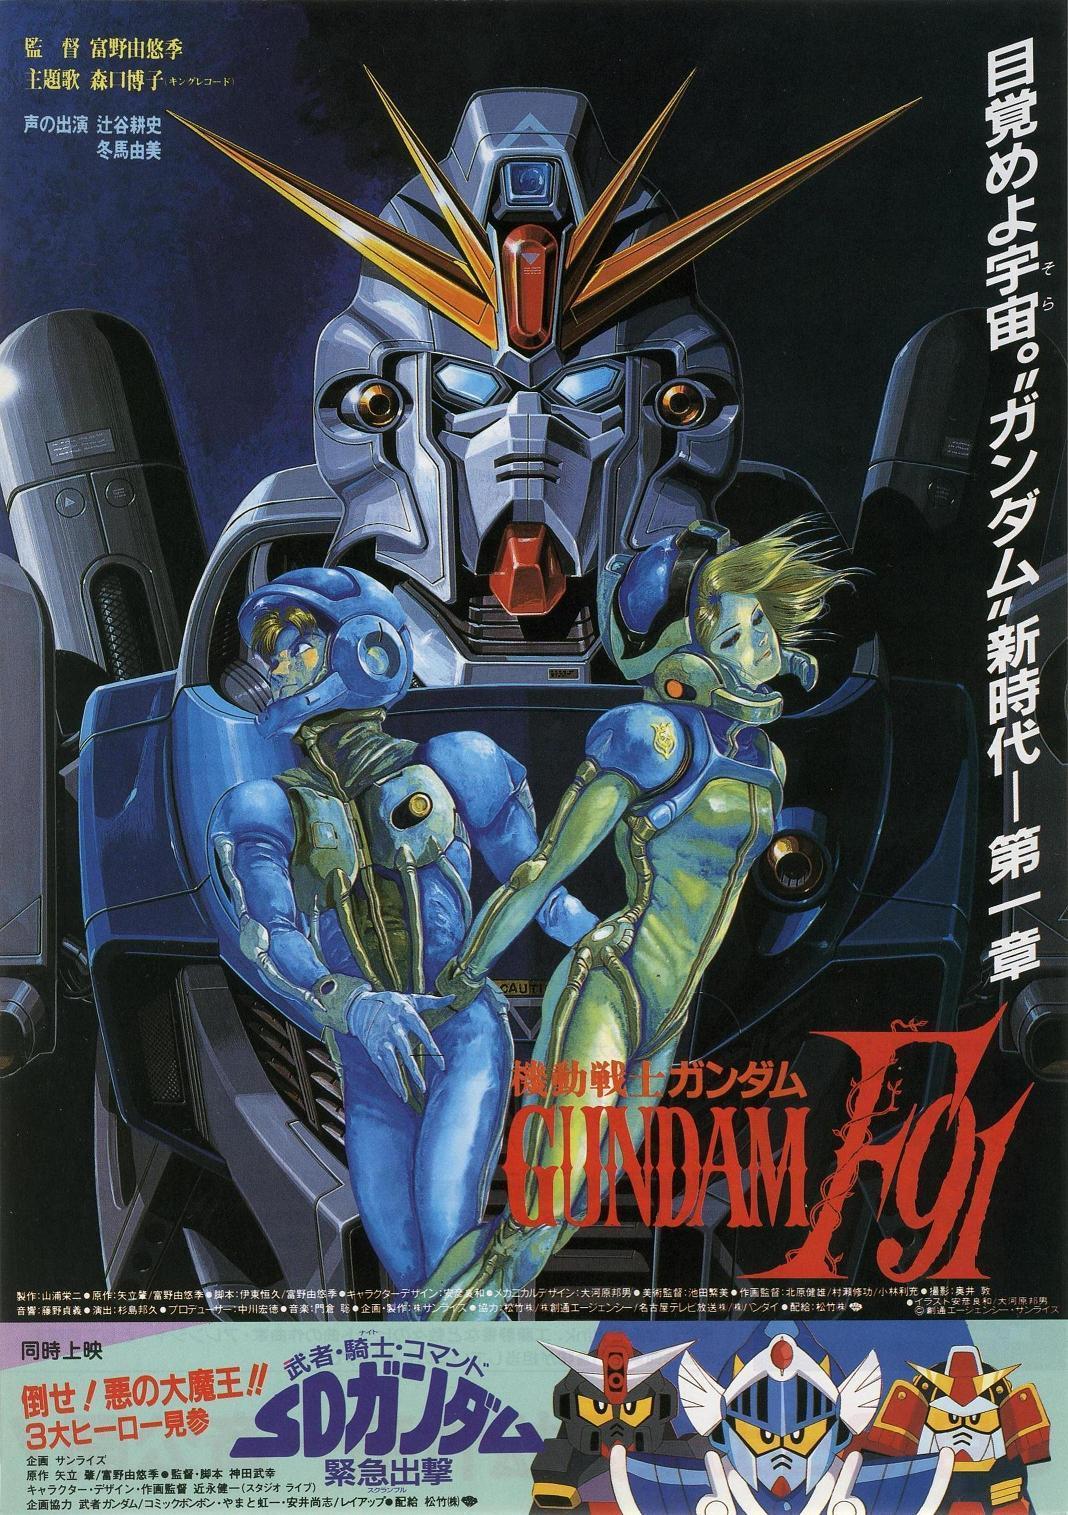 Mobile Suit Gundam F91 kapak